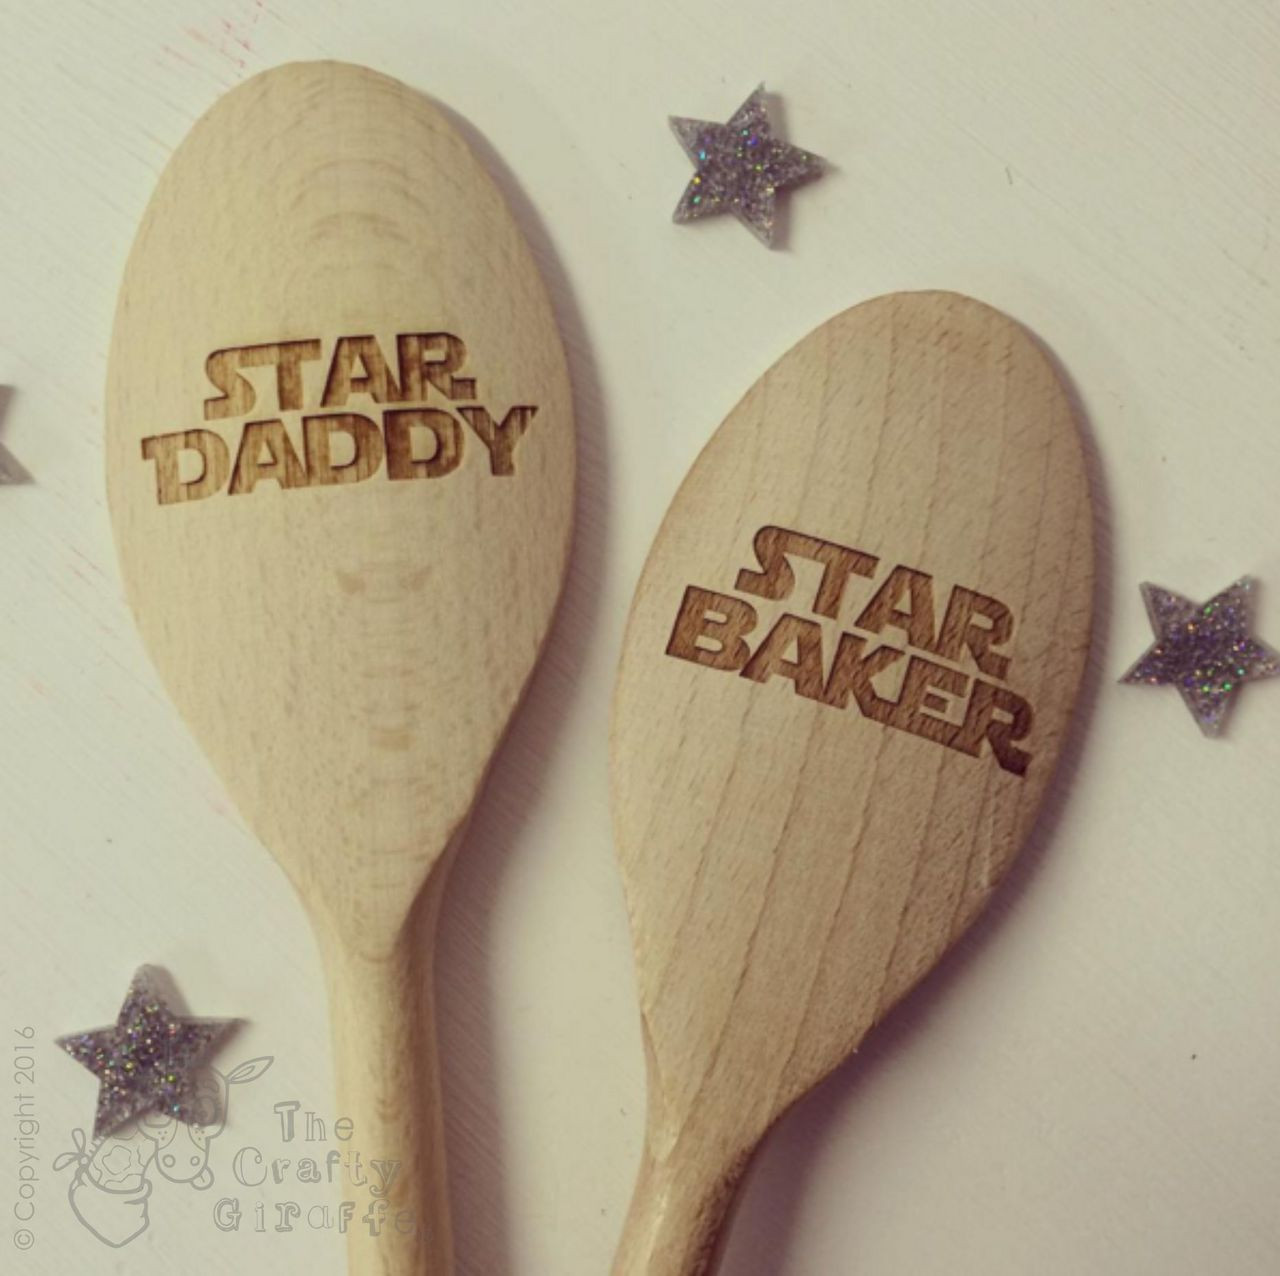 personalised star baker spoon the crafty giraffe